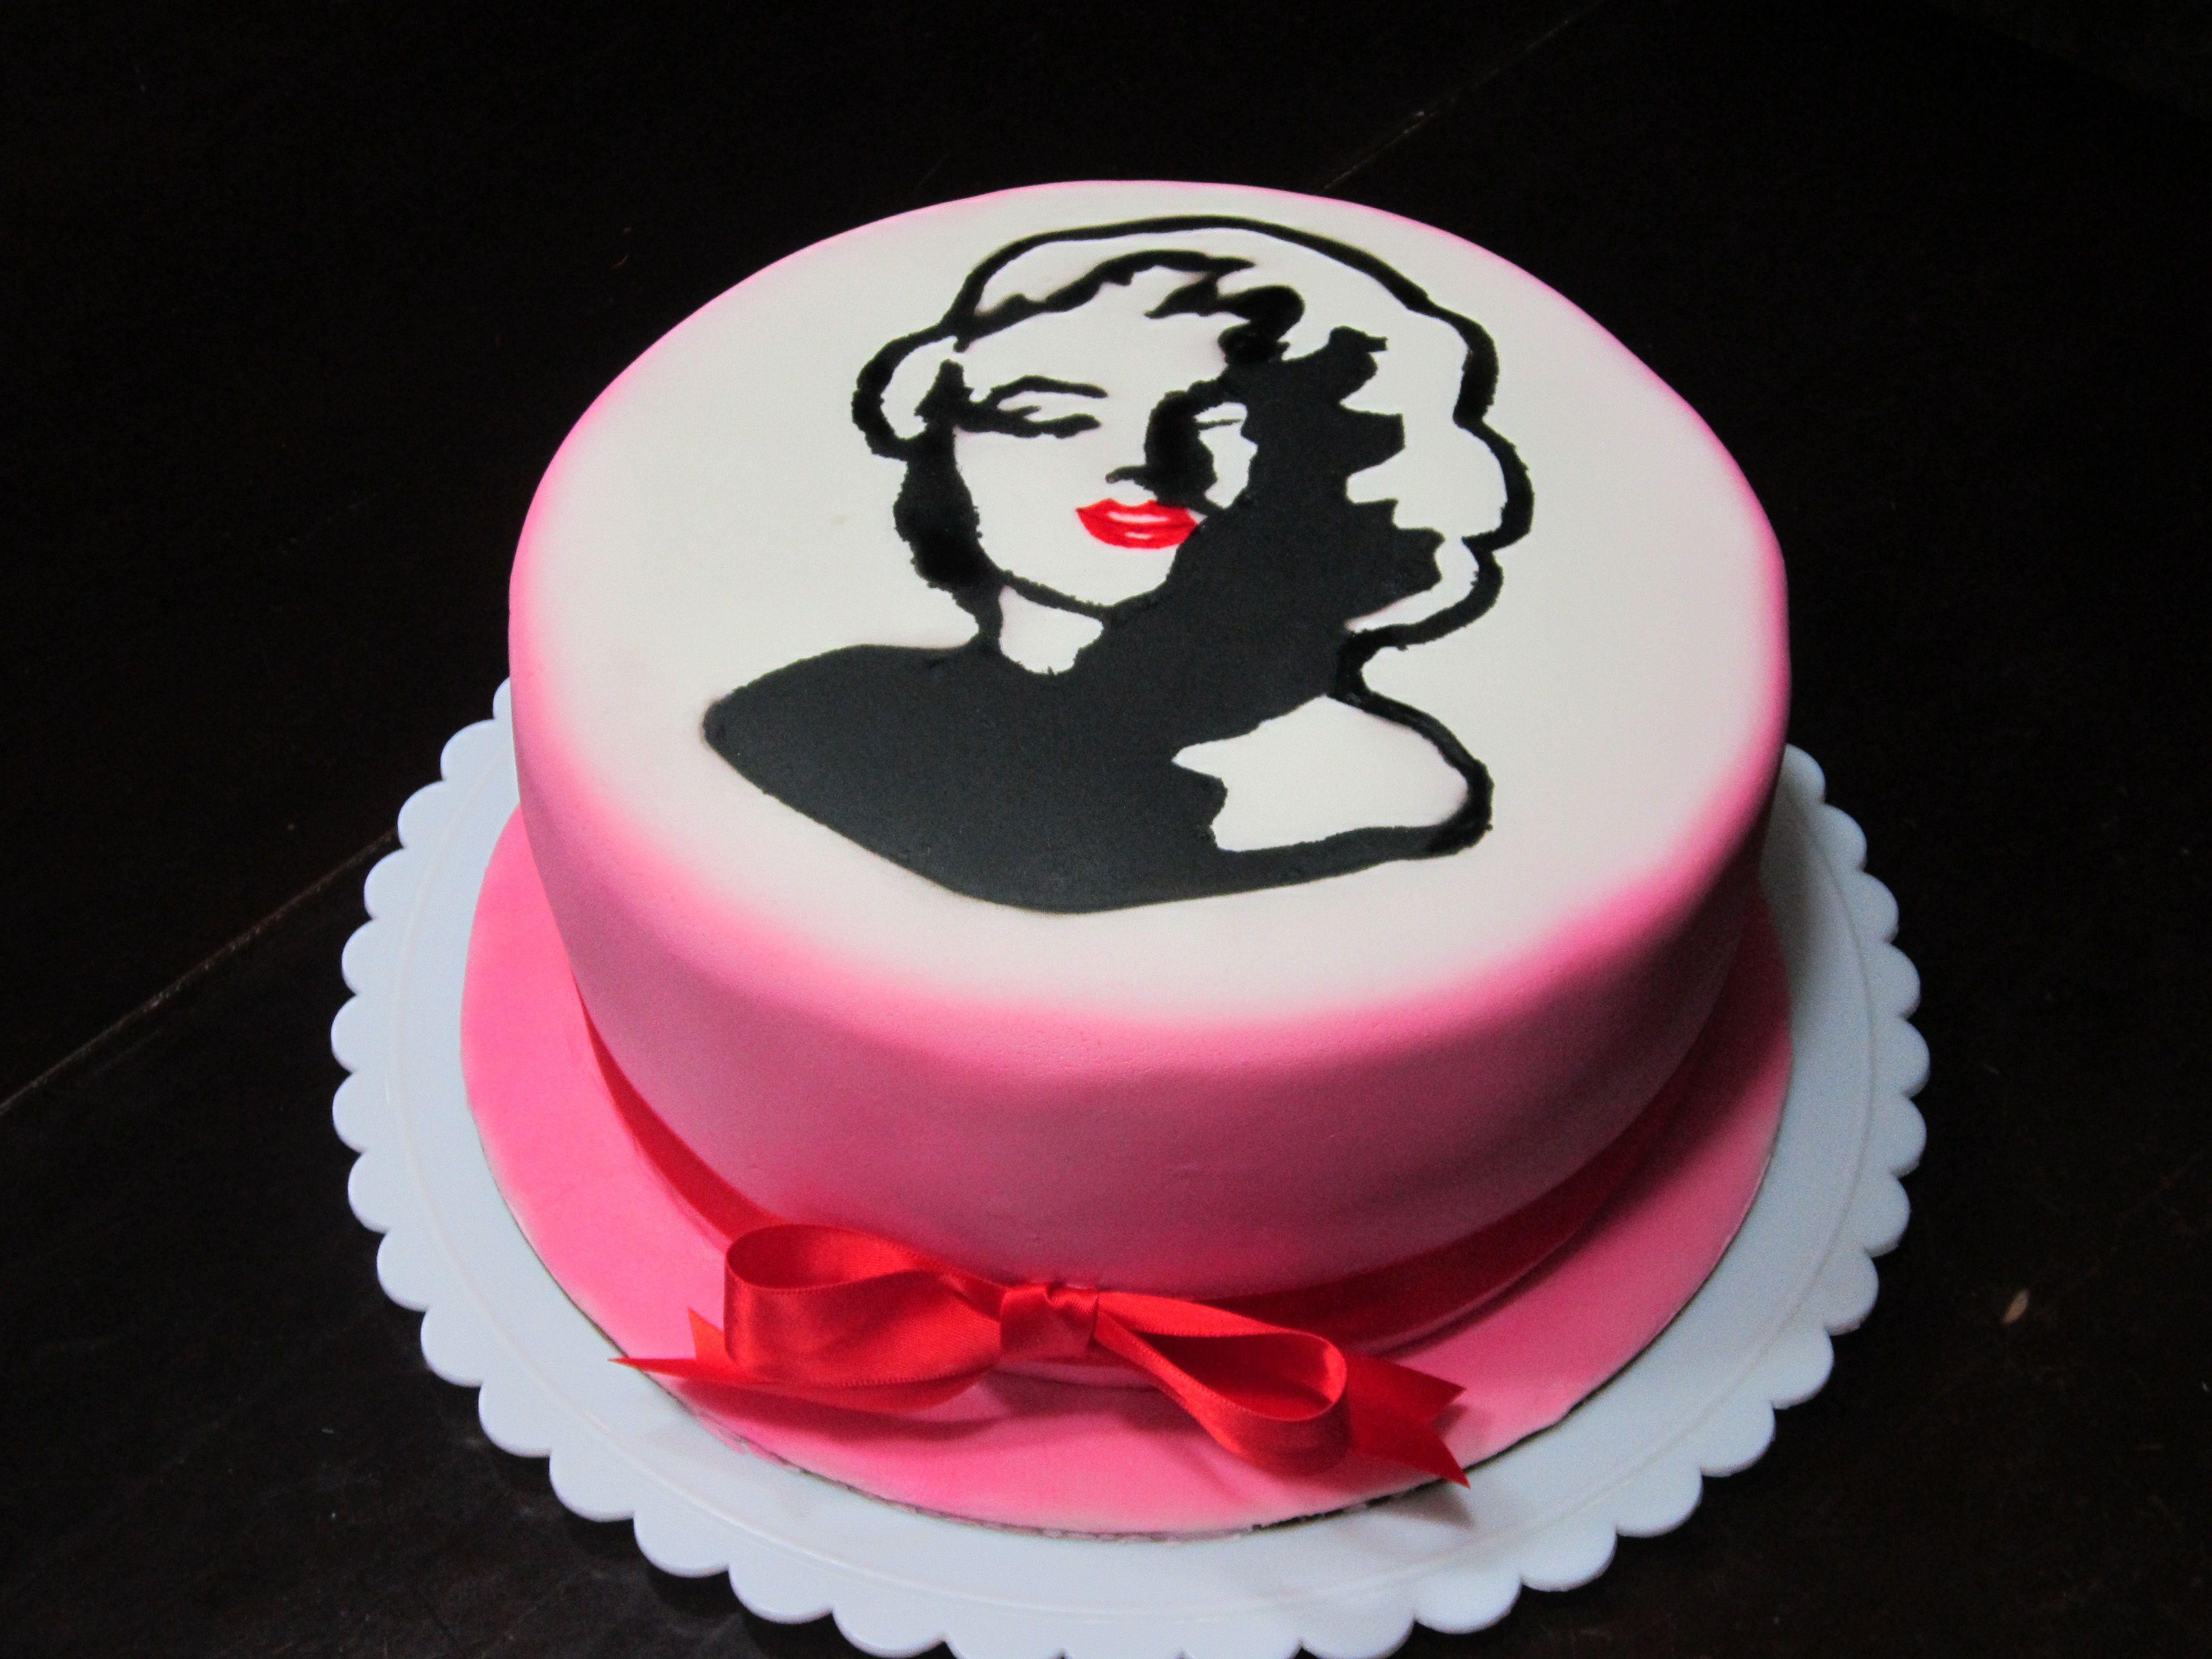 Citaten Marilyn Monroe Recipe : Marilyn monroe silhouette cake my cakes pinterest